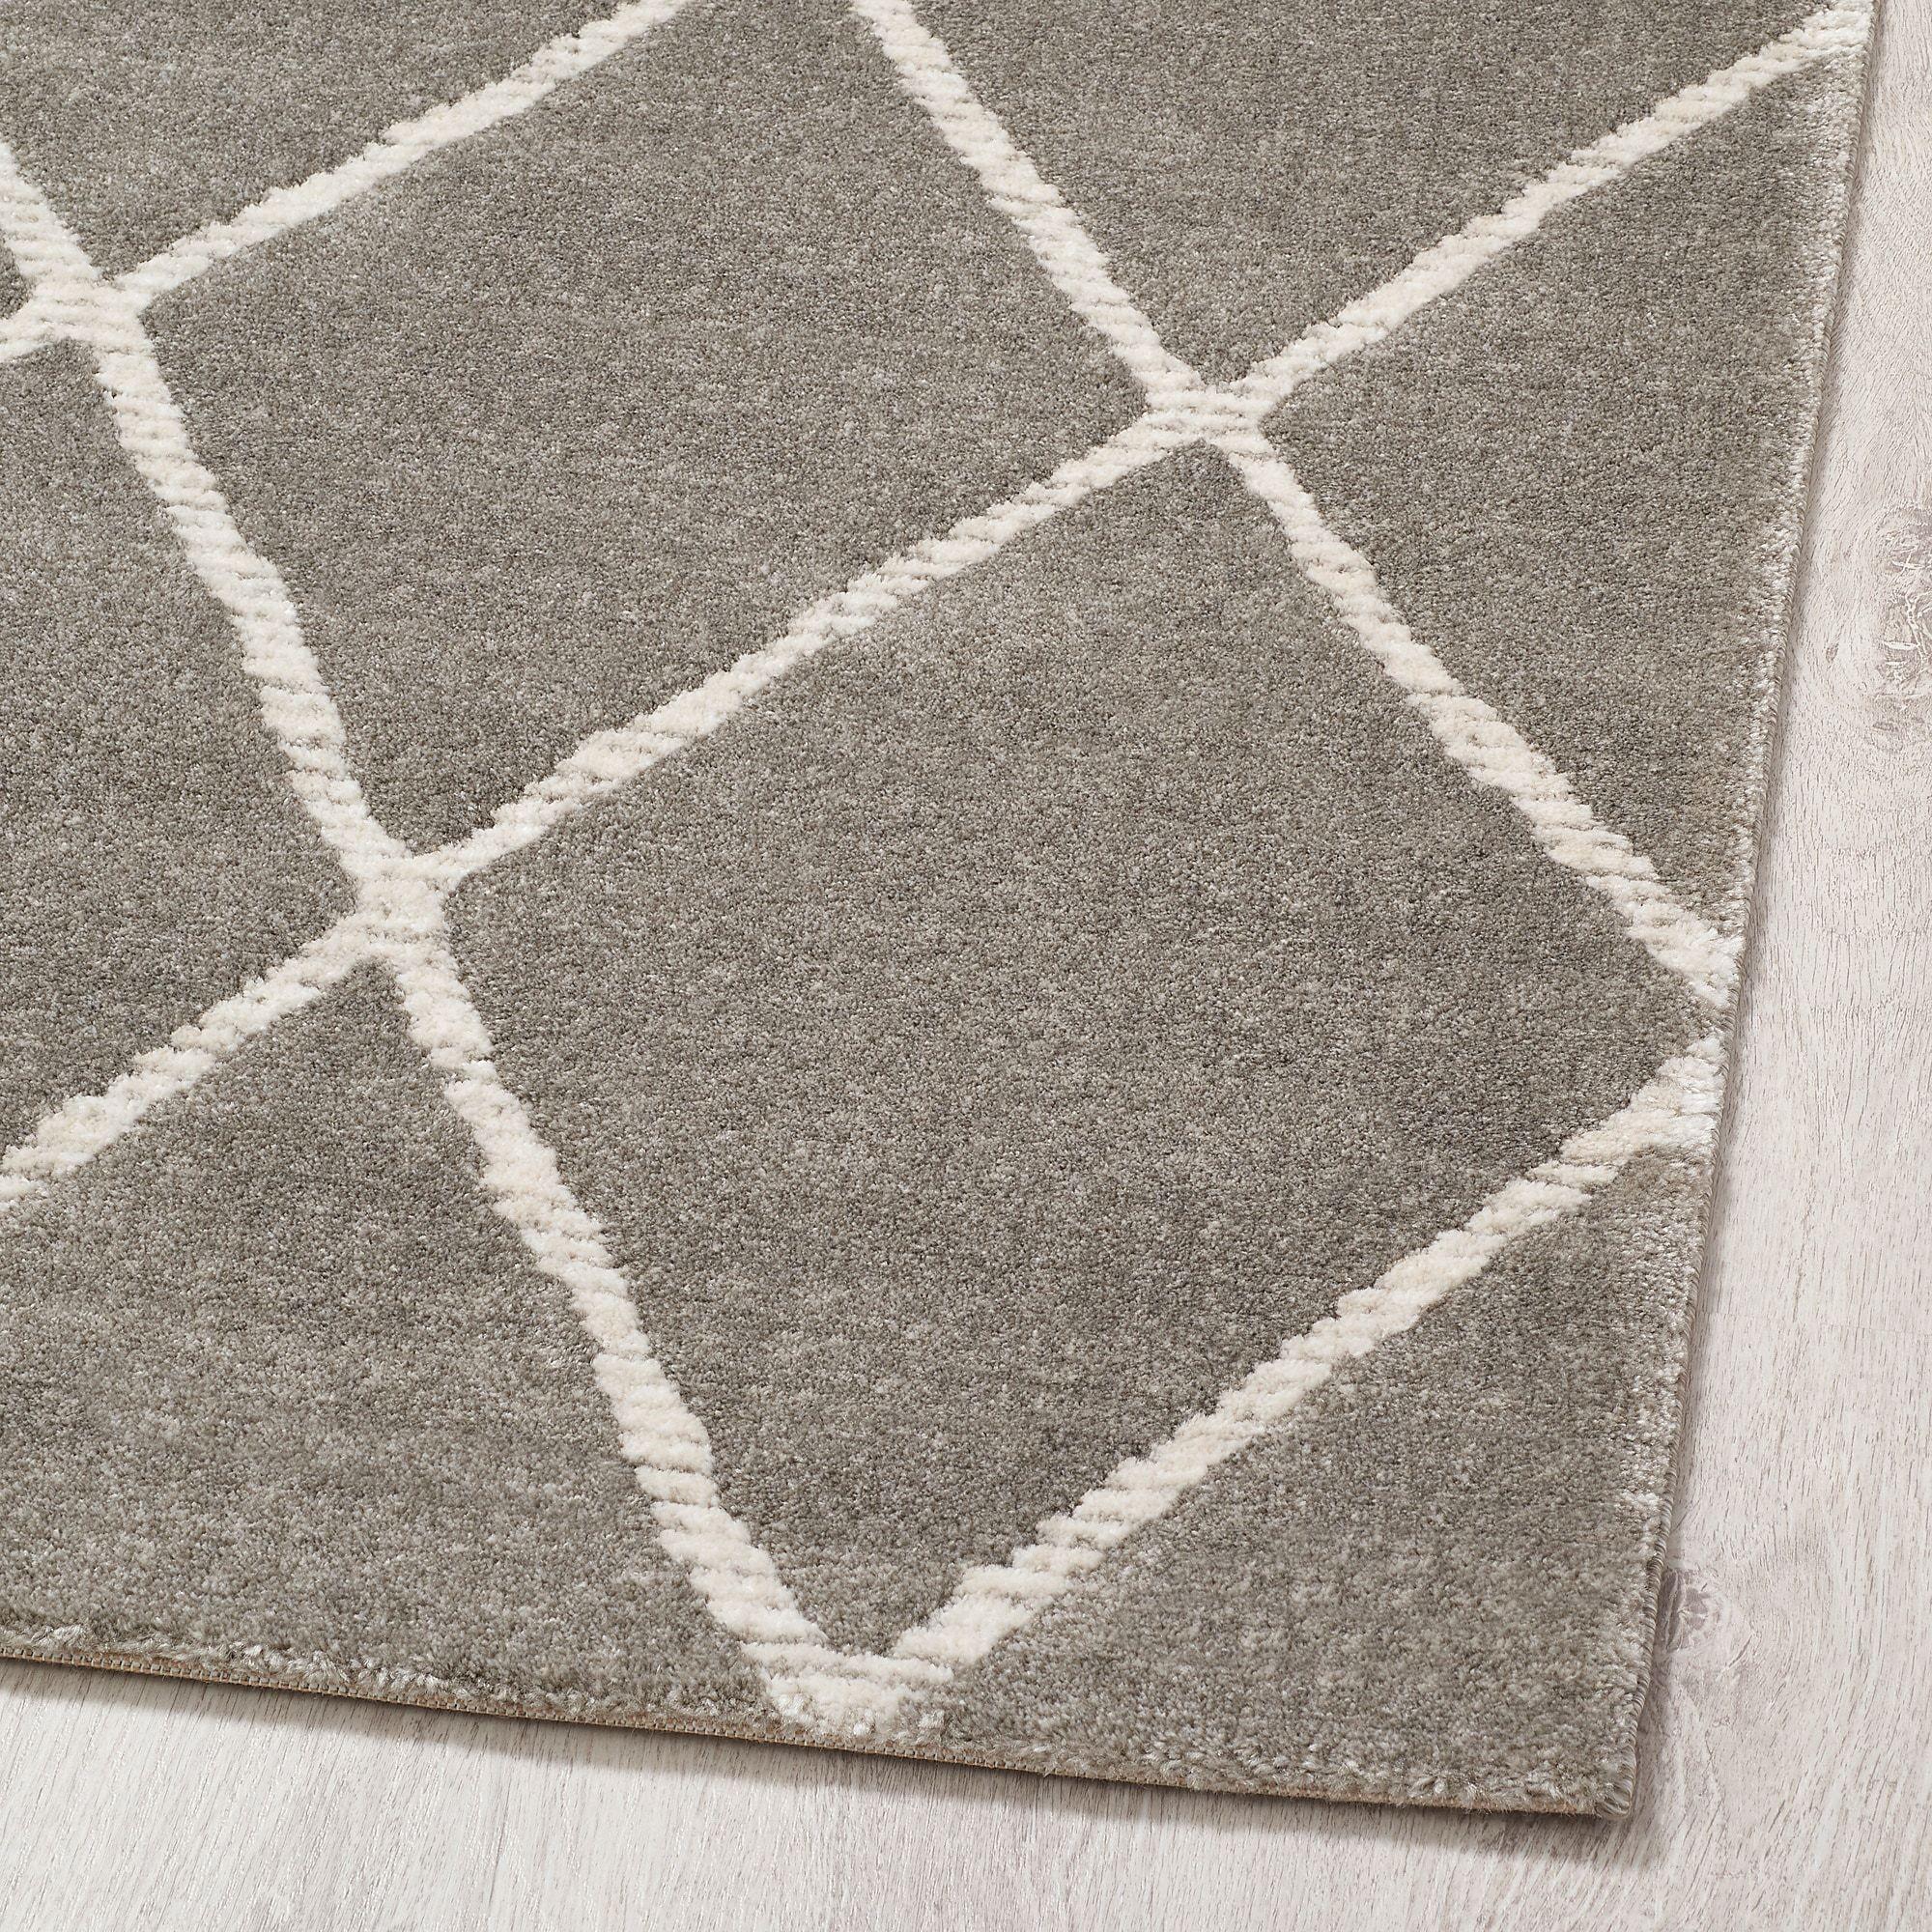 Ikea Vantore Gray White Diamond Pattern Rug Low Pile